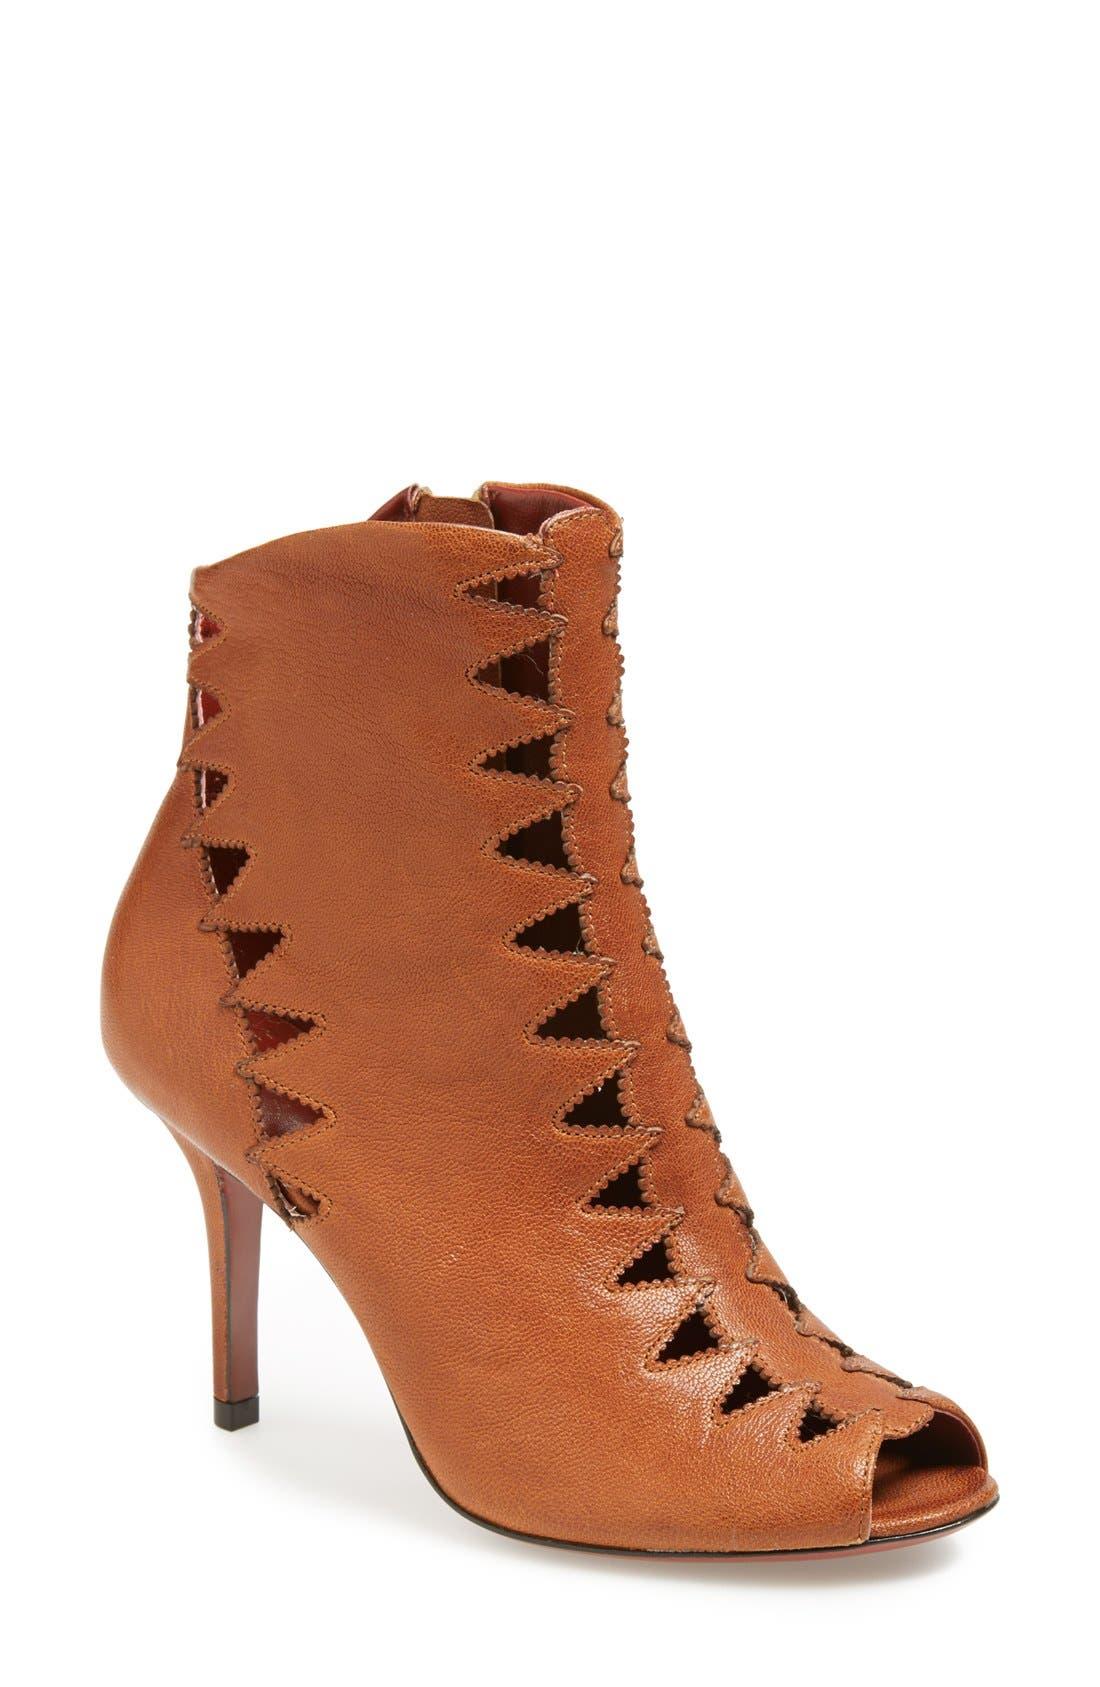 Main Image - Aerin 'Carine' Peep Toe Leather Bootie (Women)